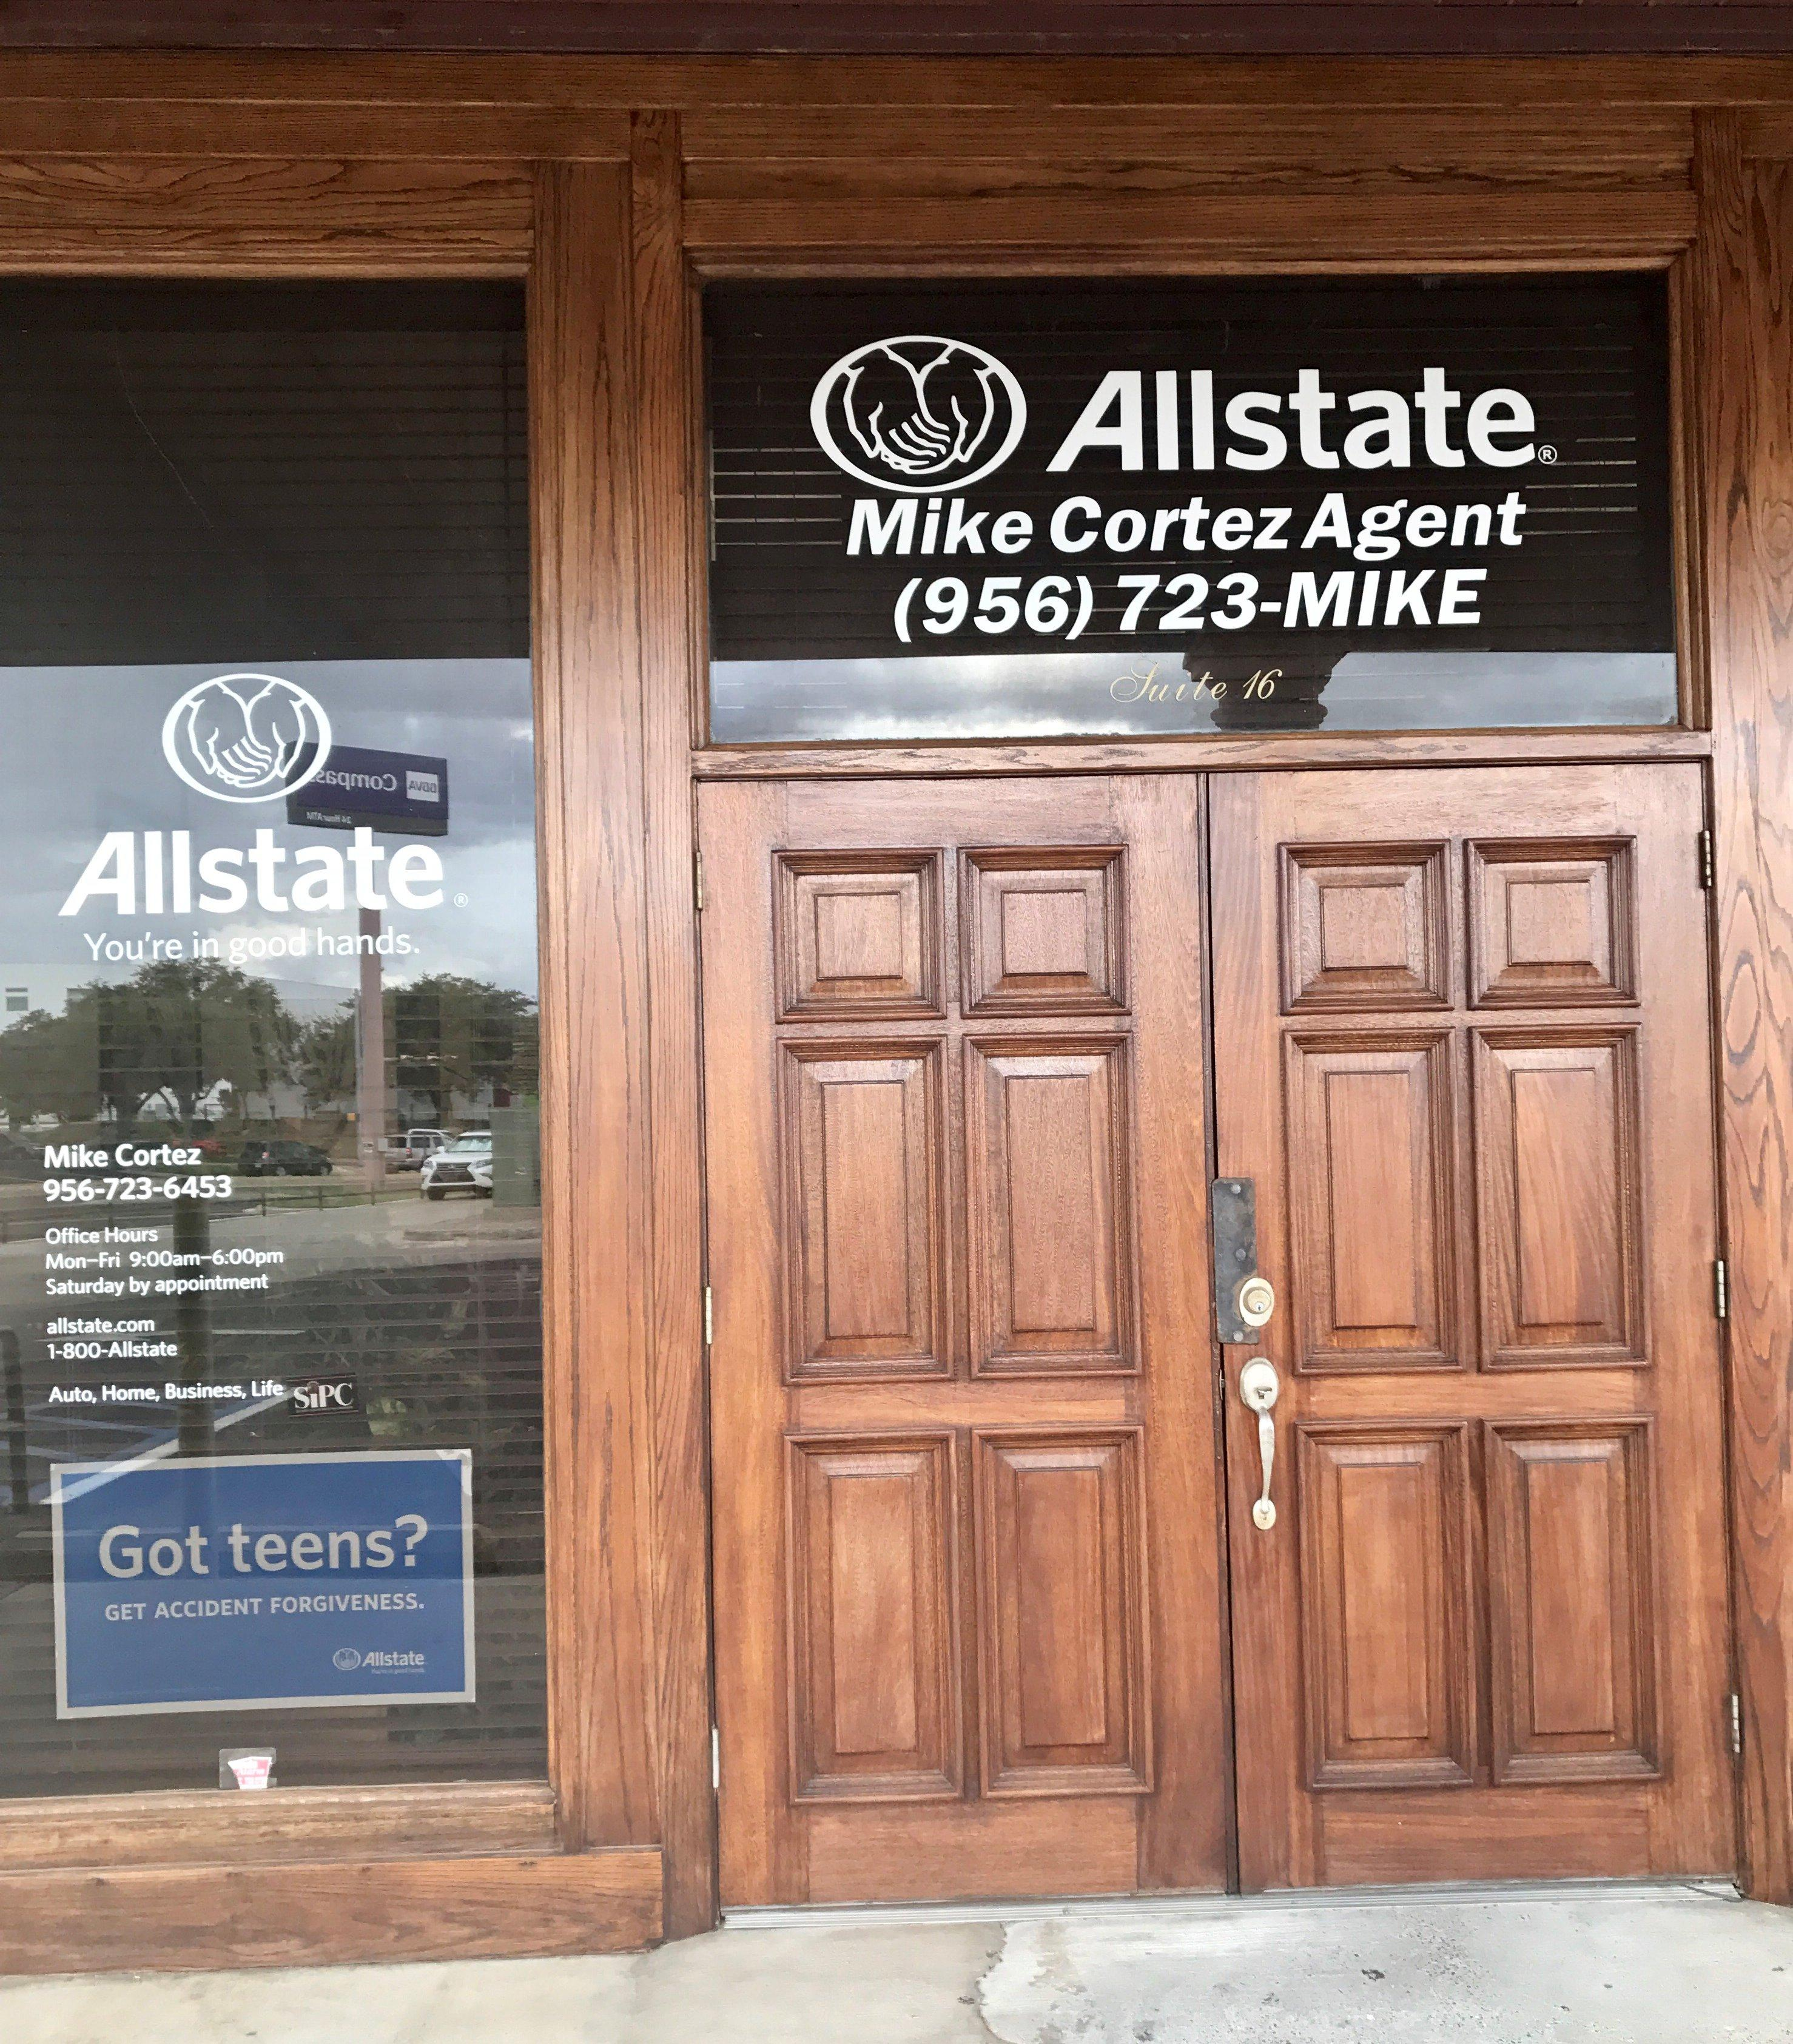 Mike Cortez: Allstate Insurance image 2